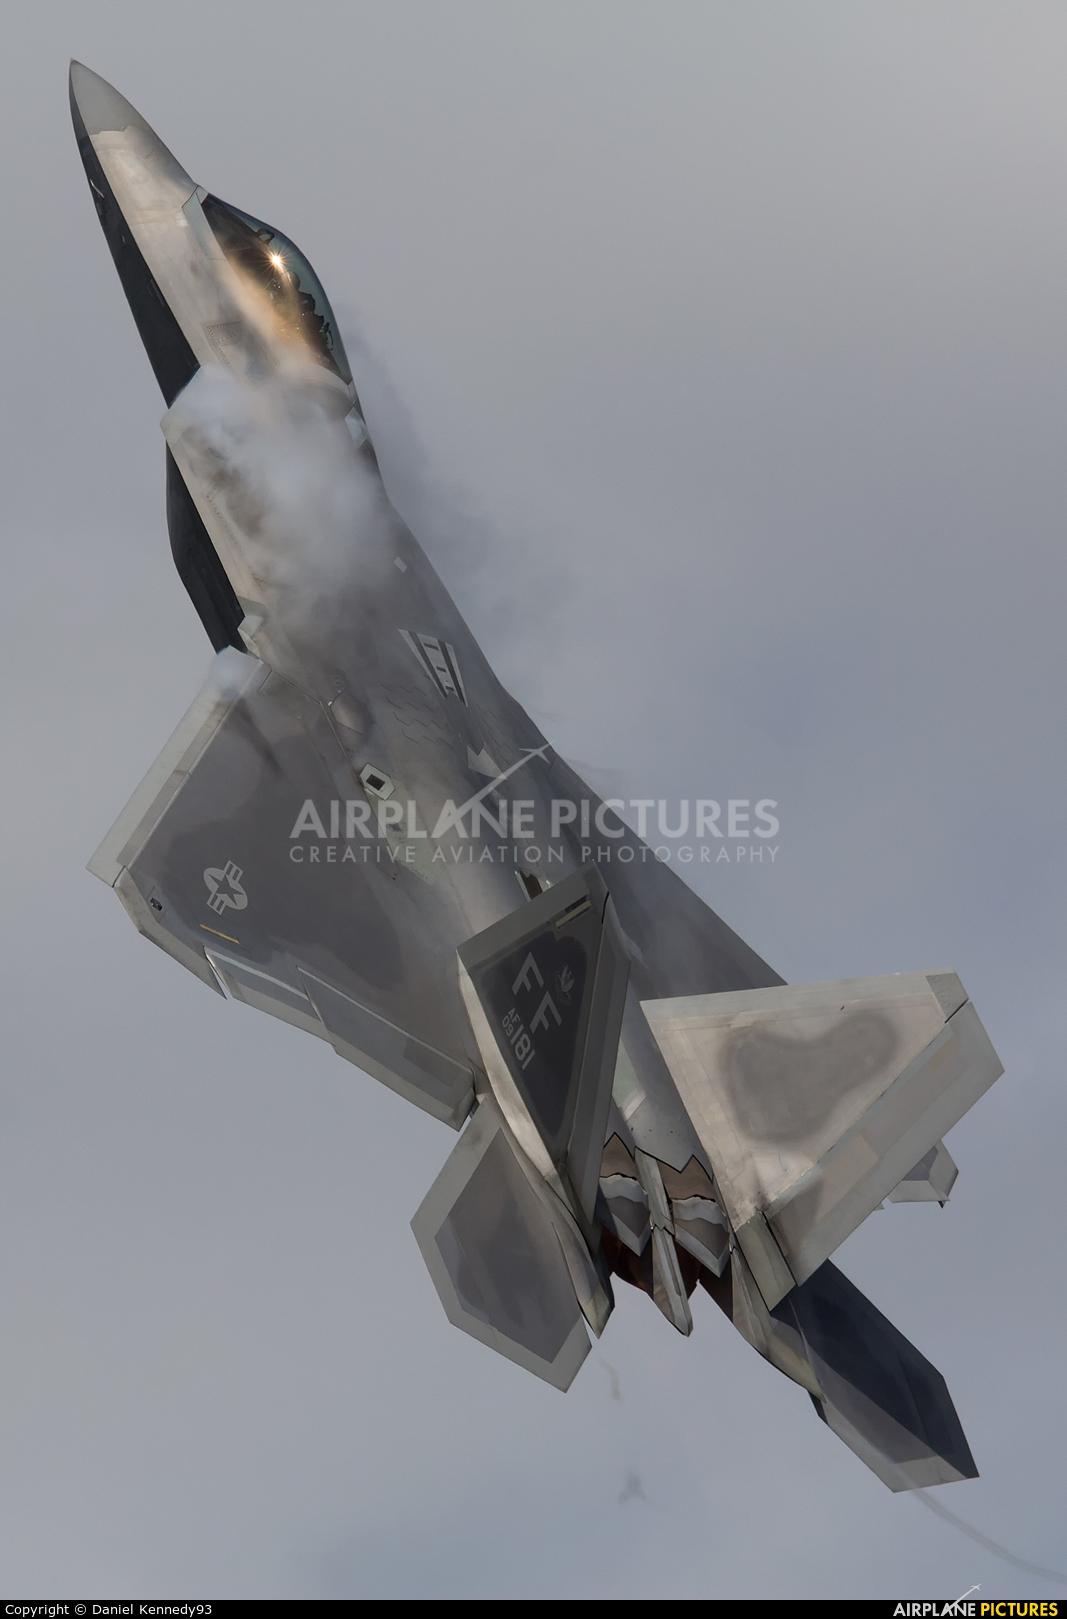 USA - Air Force 09-181 aircraft at Fairford